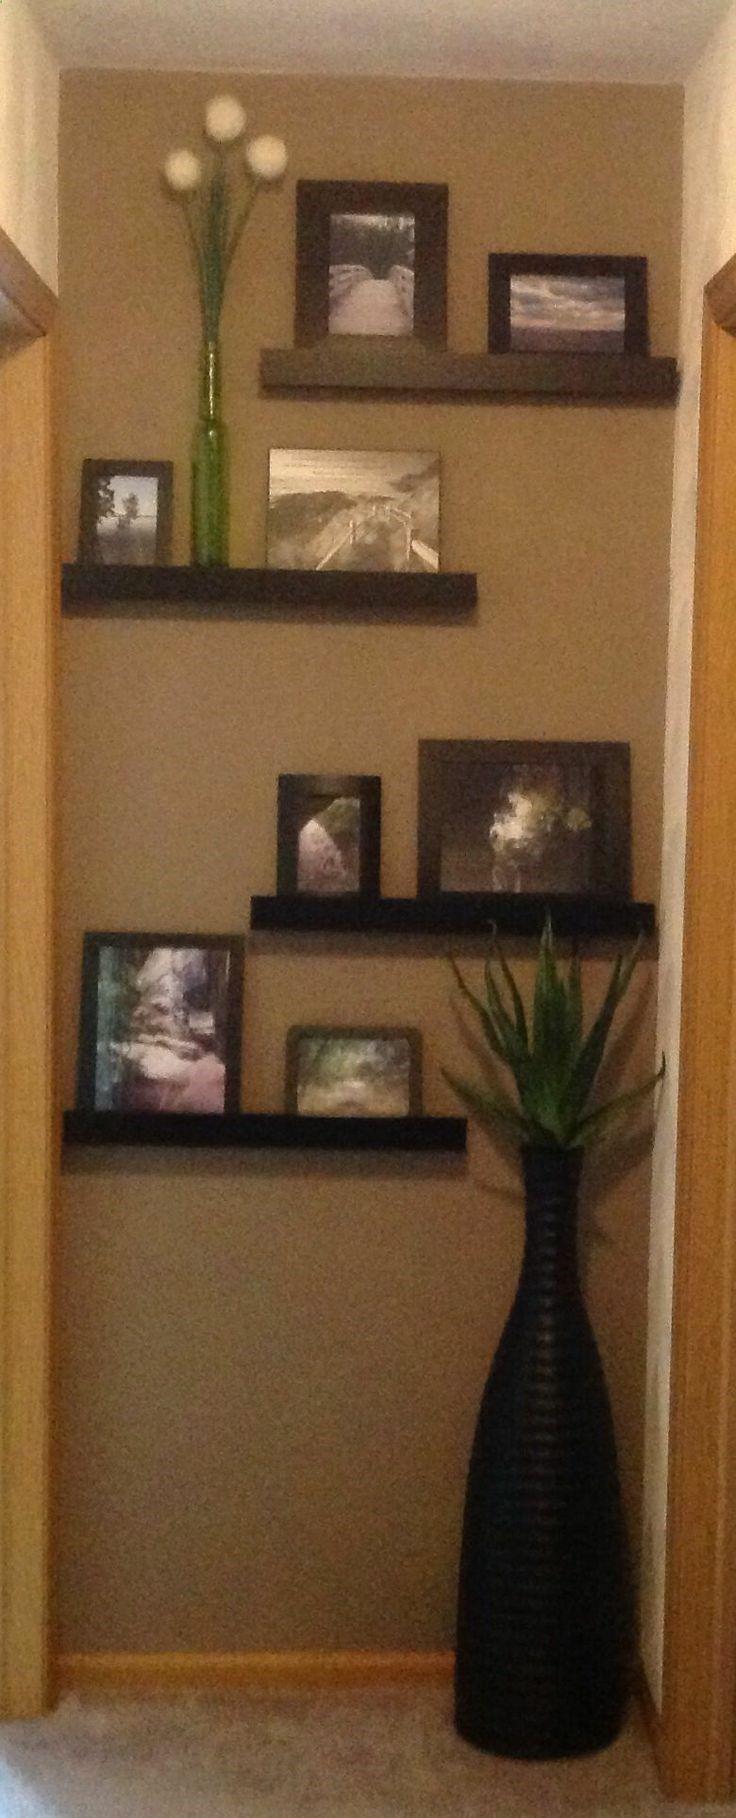 Best 25 Narrow hallway decorating ideas on Pinterest  Narrow entryway Small hallway table and